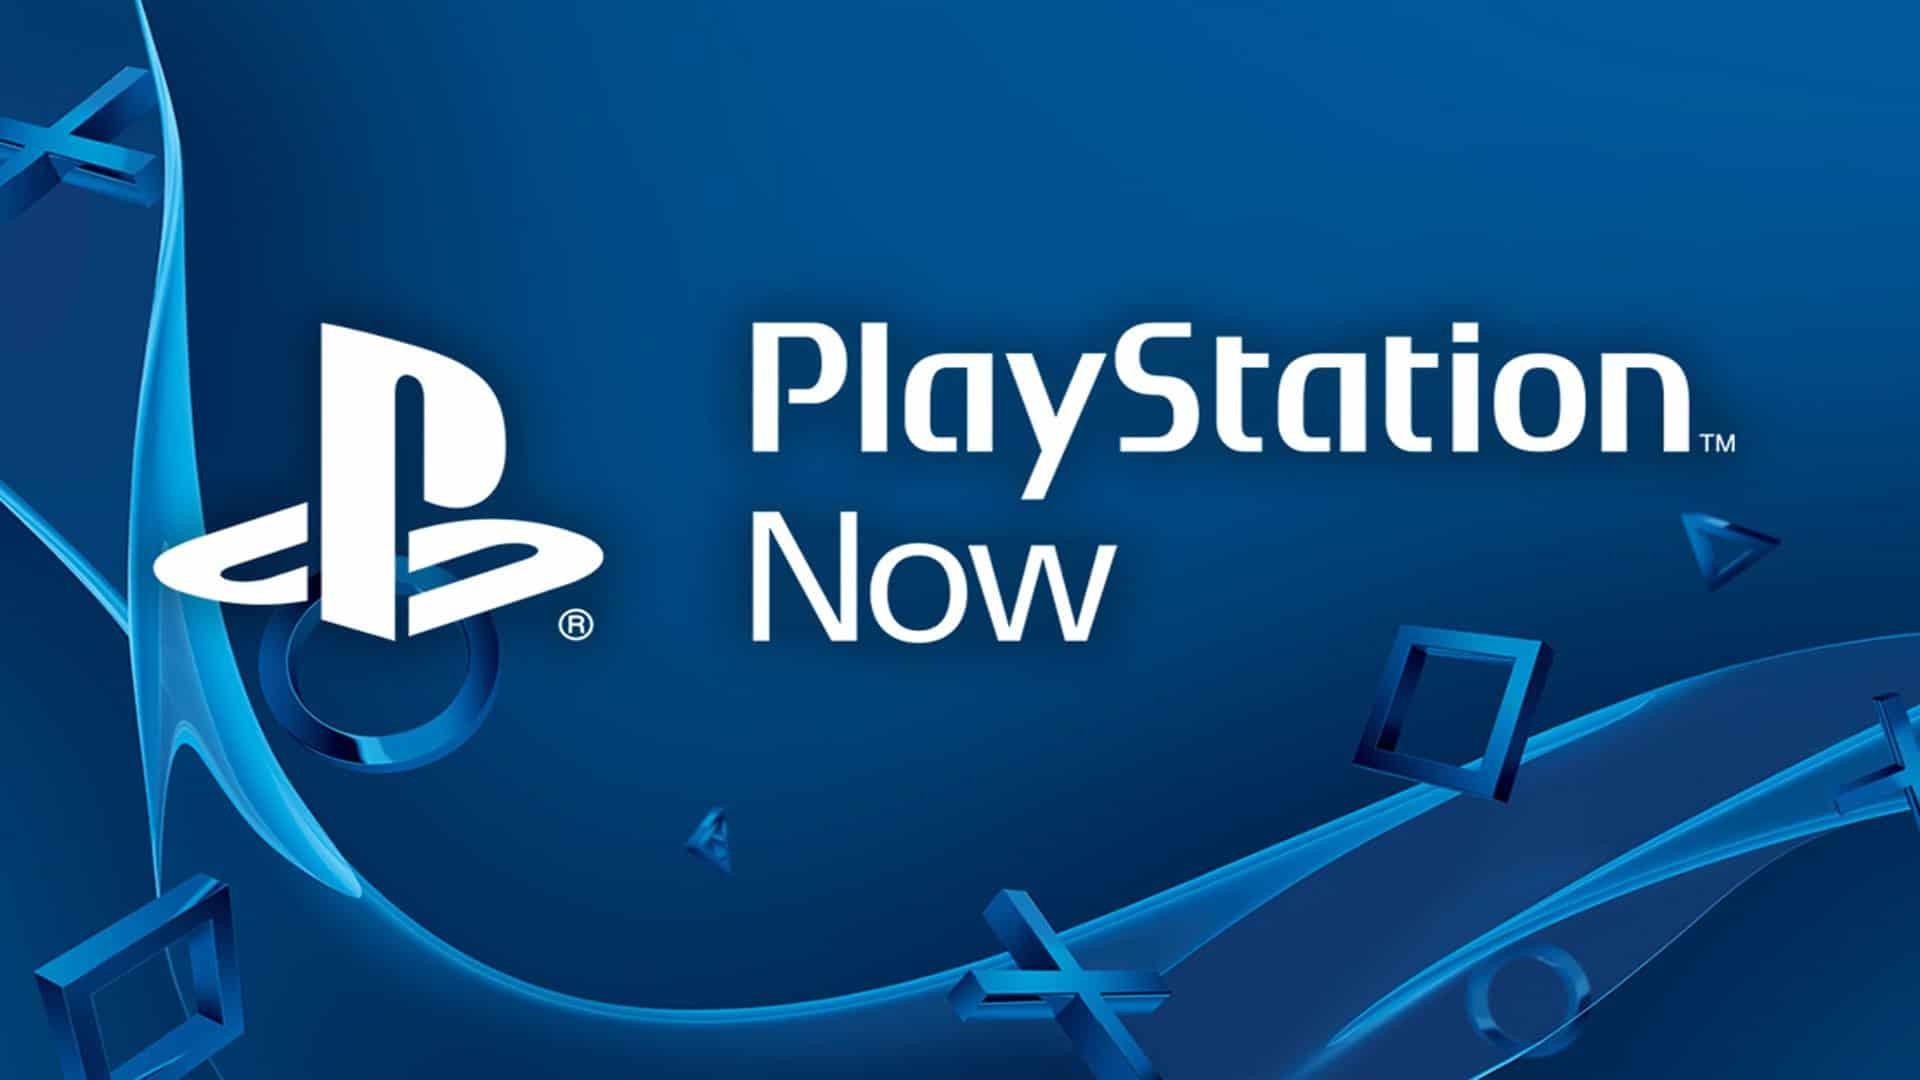 PlayStation Now arriva su PC [RUMOUR CONFERMATO]